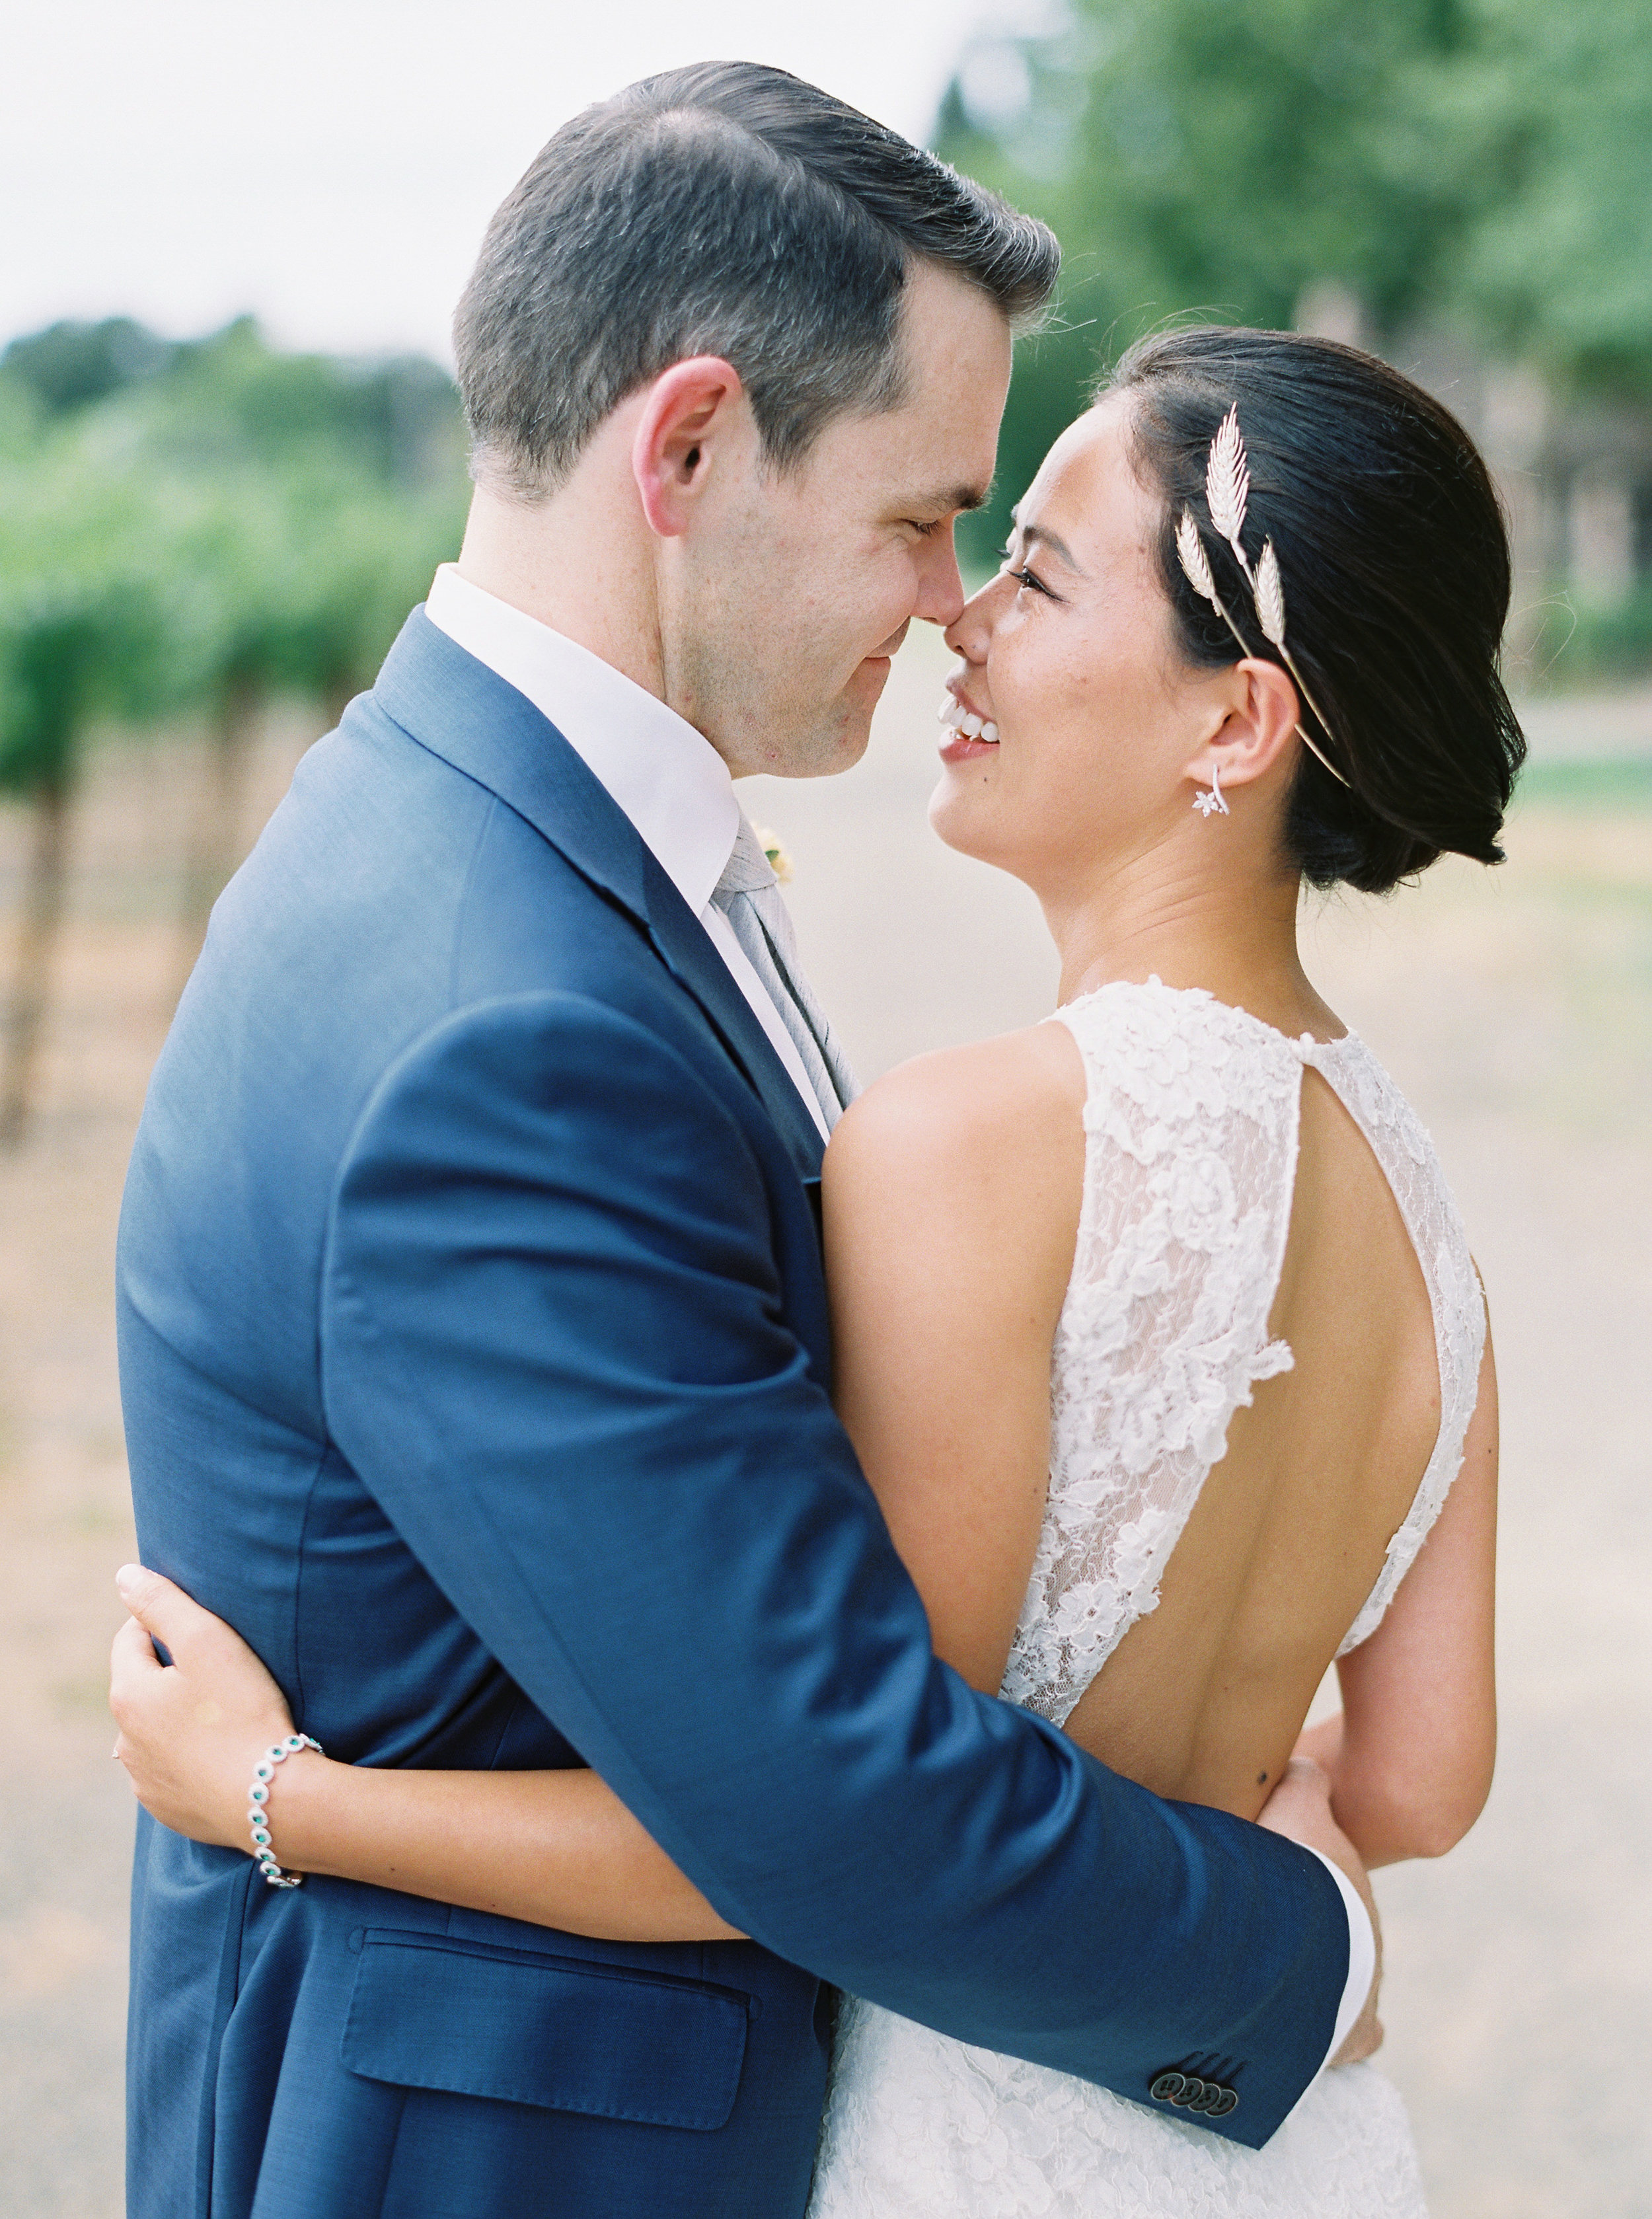 Harvest-inn-wedding-in-napa-california-264.jpg